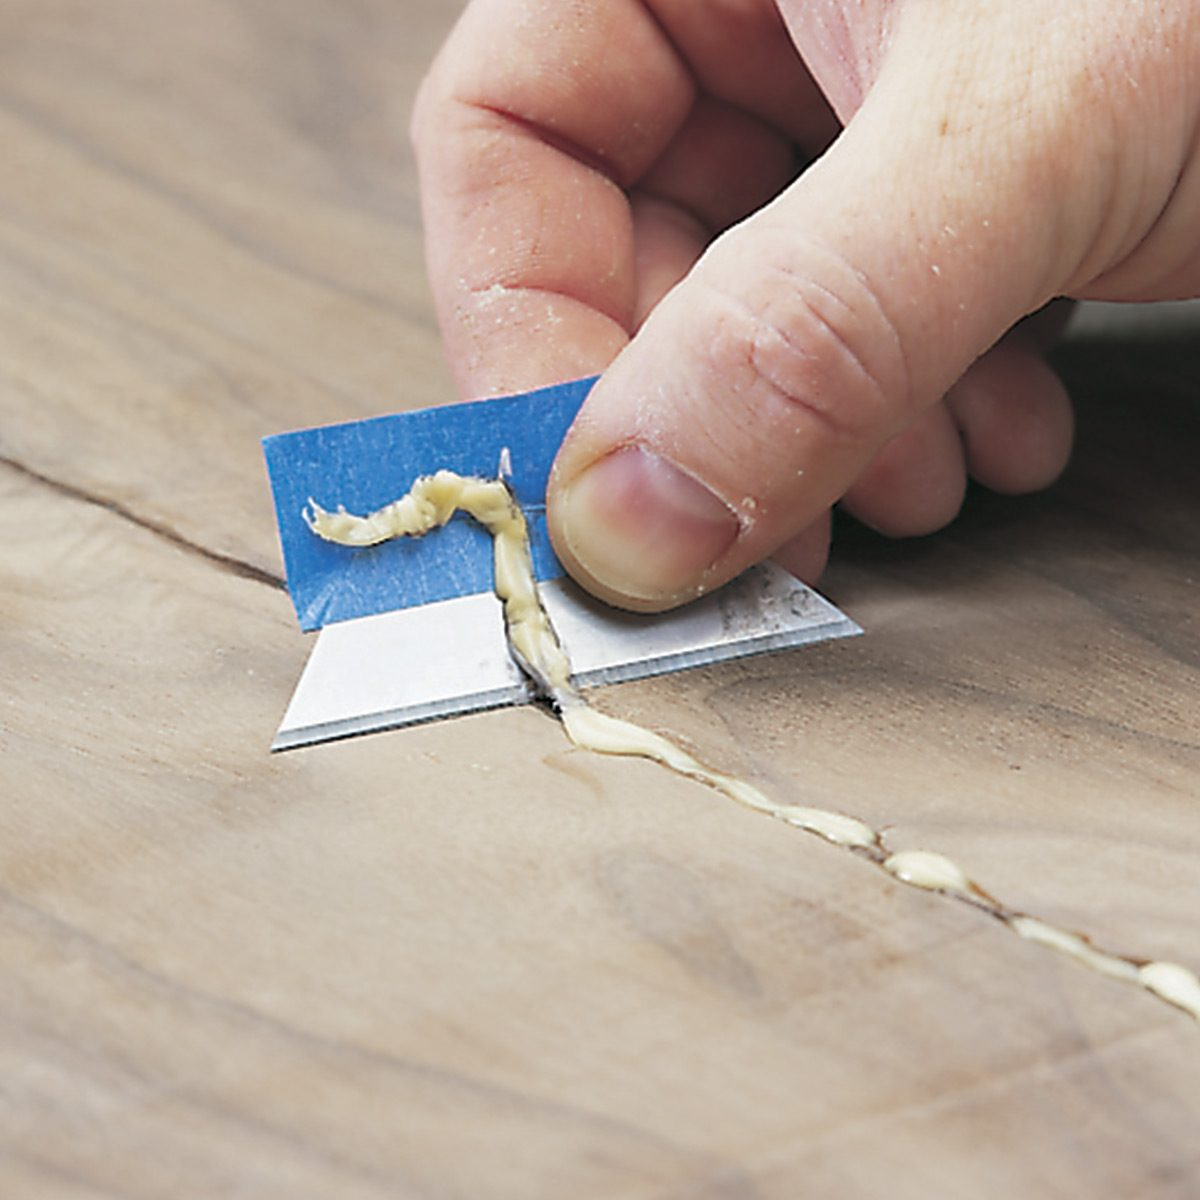 razor blade glue removal